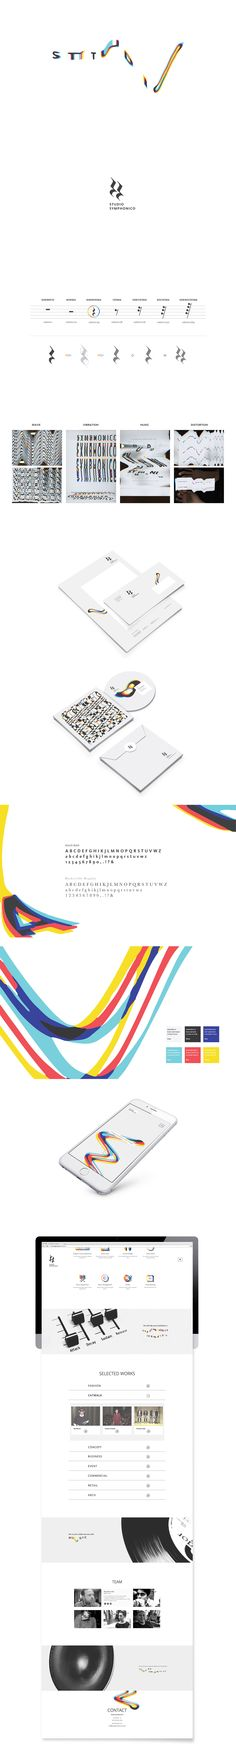 Studio Symphonico - music counsulting - brand identity - corporate - graphic design - lettering - distortion - glitch - by Drogheria Creativa